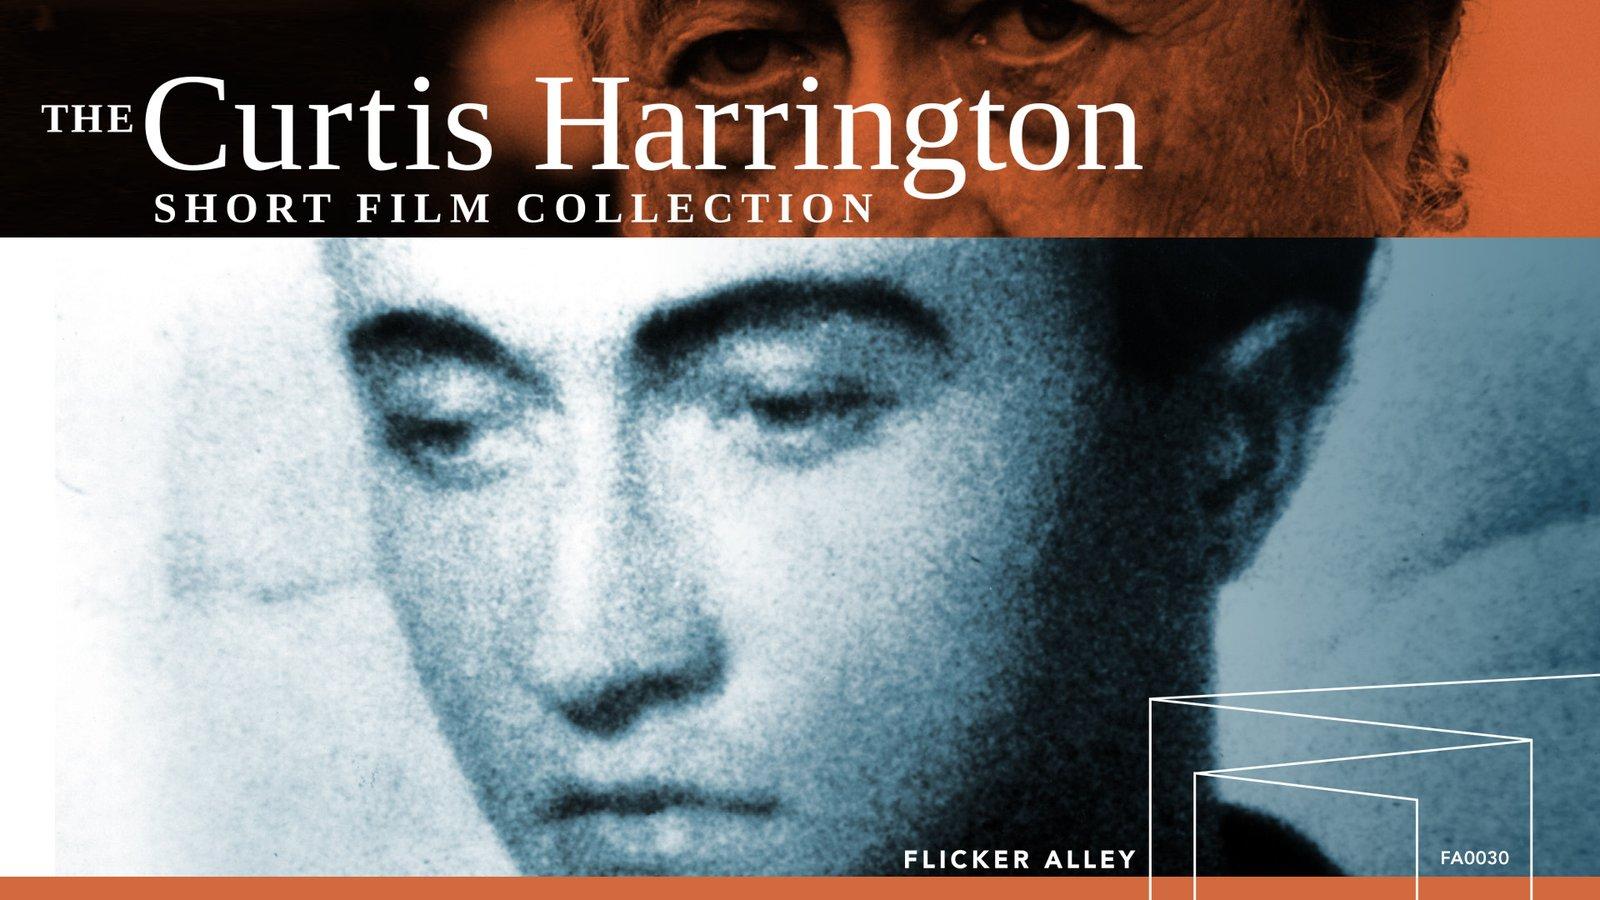 Curtis Harrington Short Film Collection